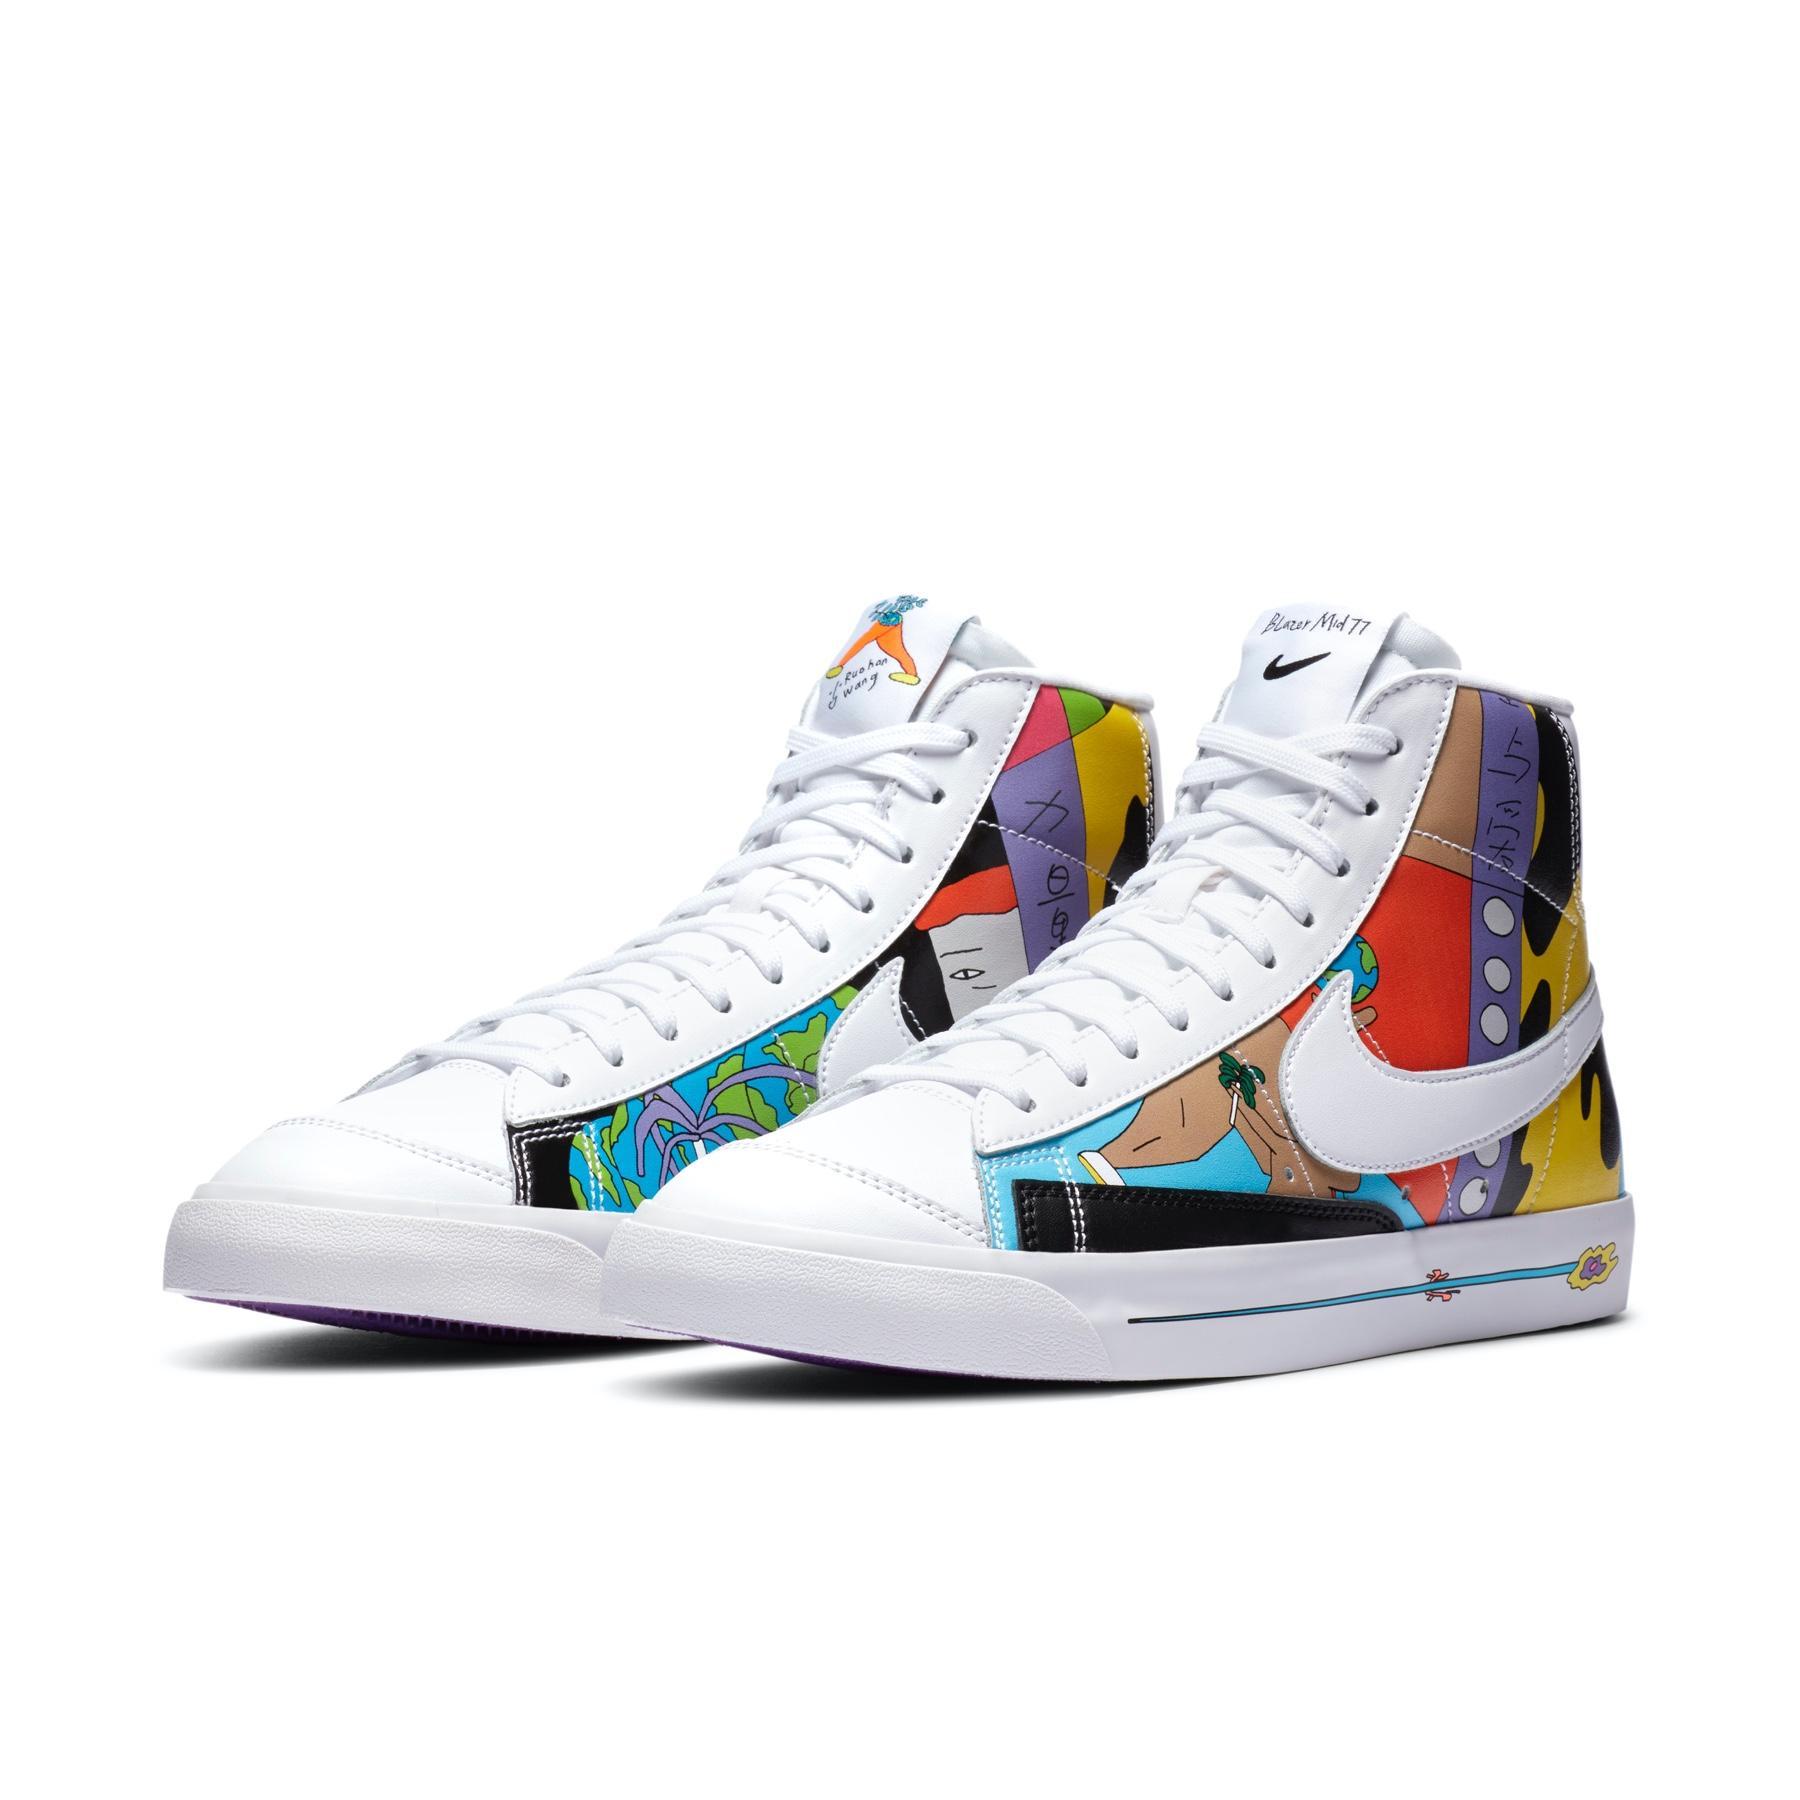 Ruohan Wang x Nike Blazer Mid